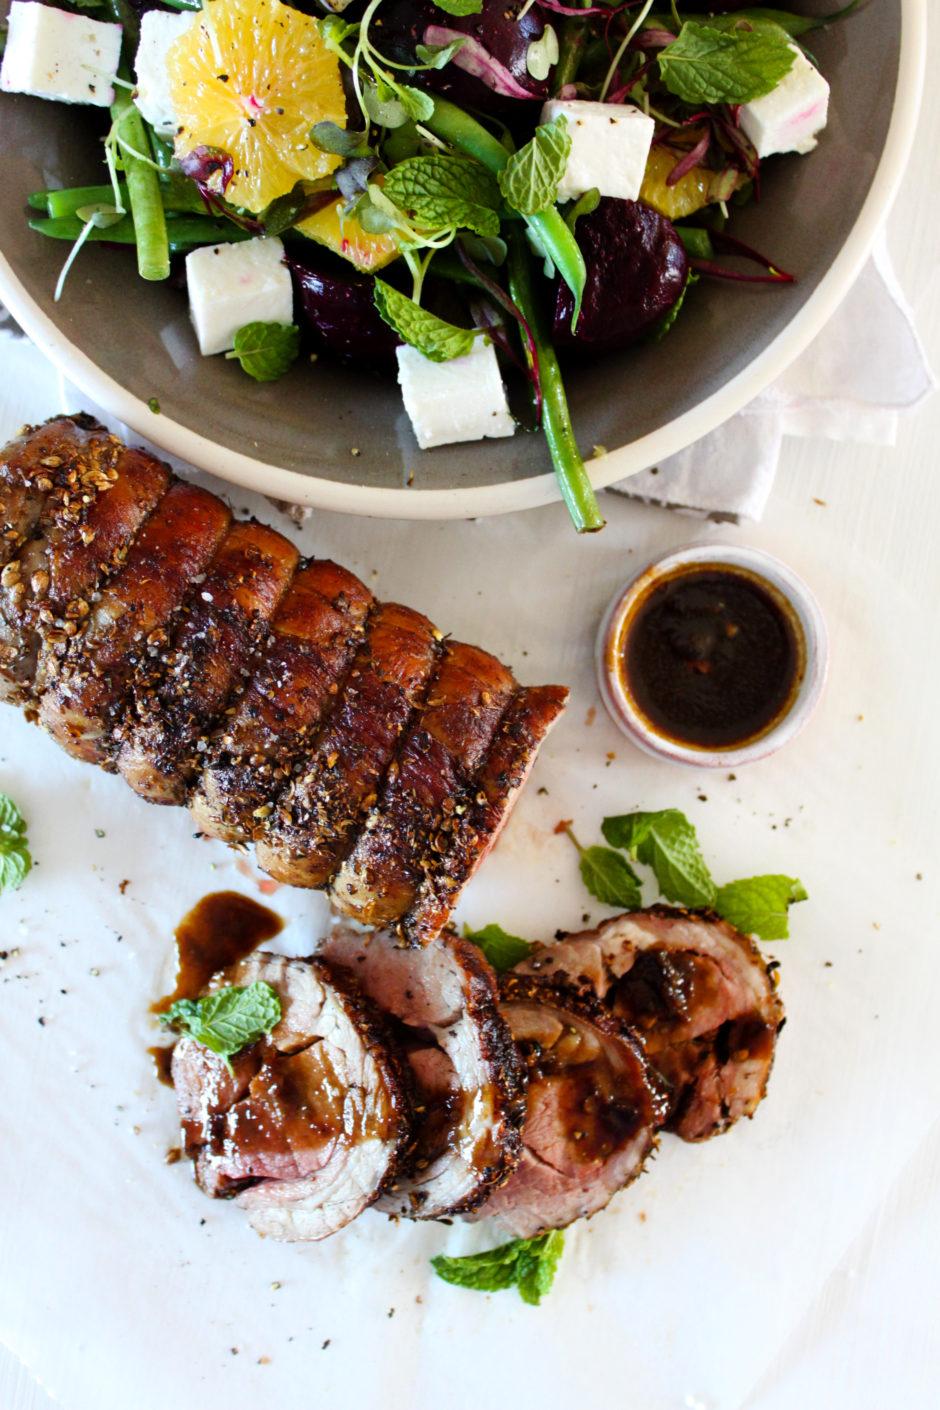 Succulent Lamb Noisette with Salad Recipe